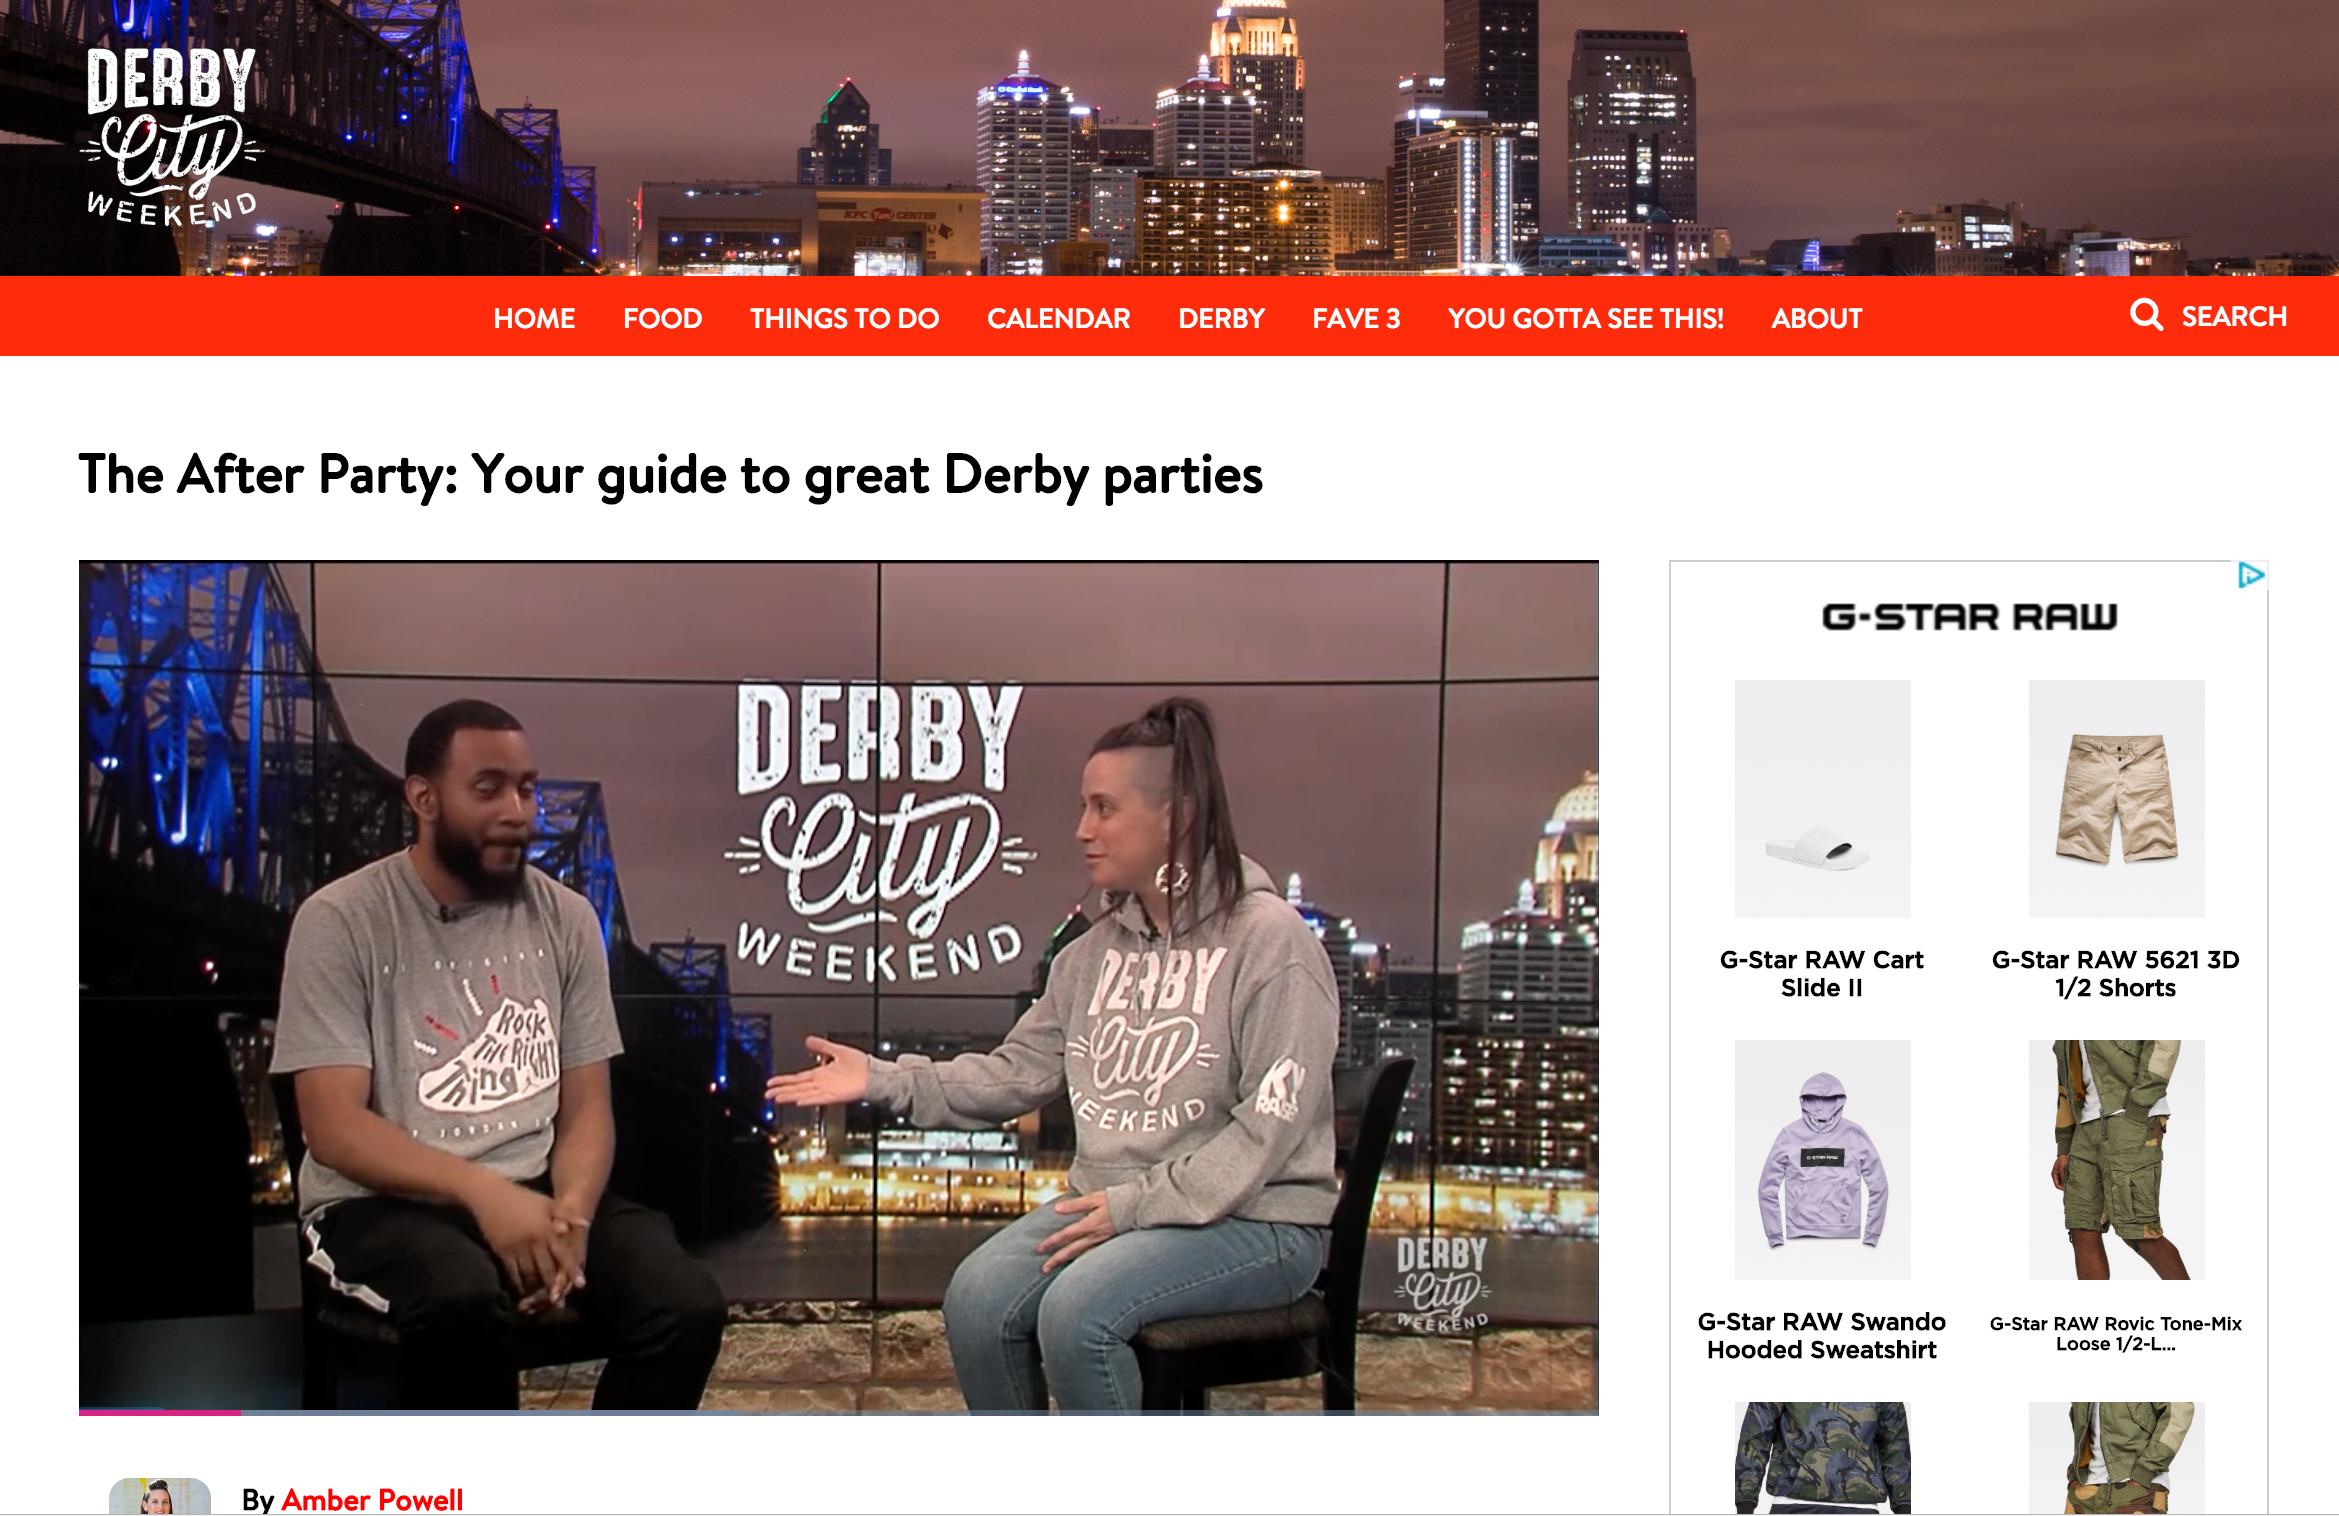 Derb  yCityWeekend.com